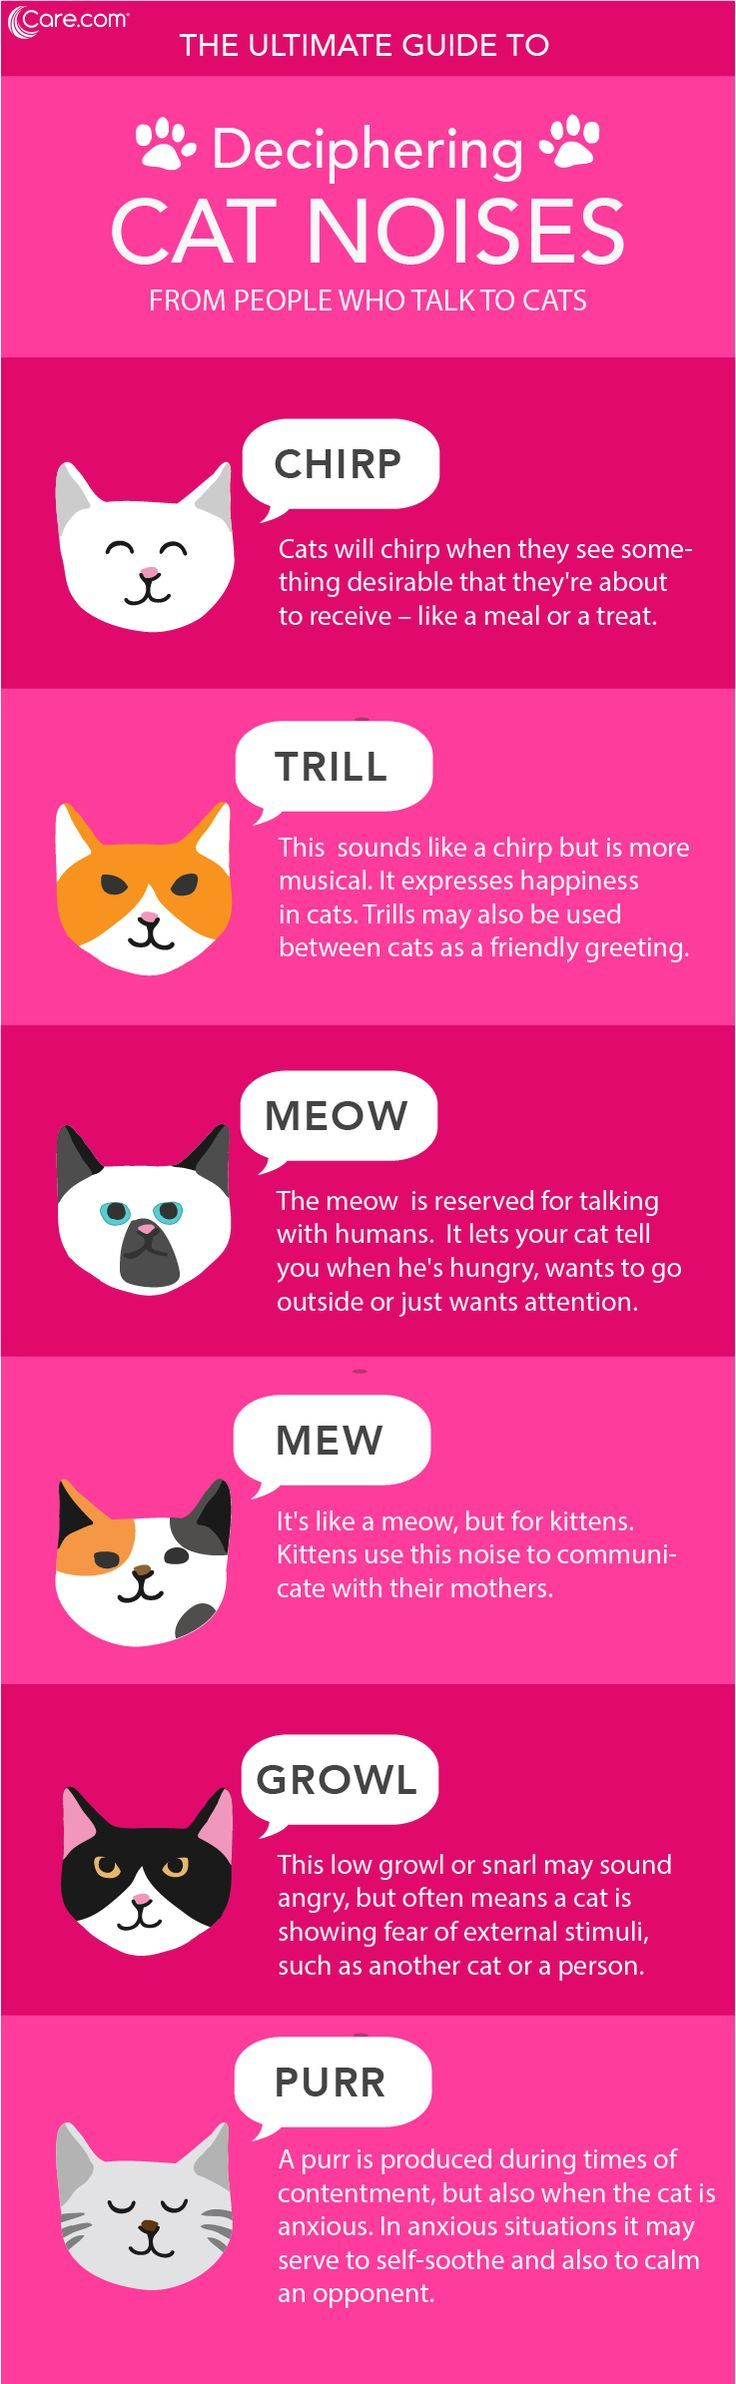 Cat Language 101 Learning Cat Noises Cat Noises Cat Language Cat Behavior